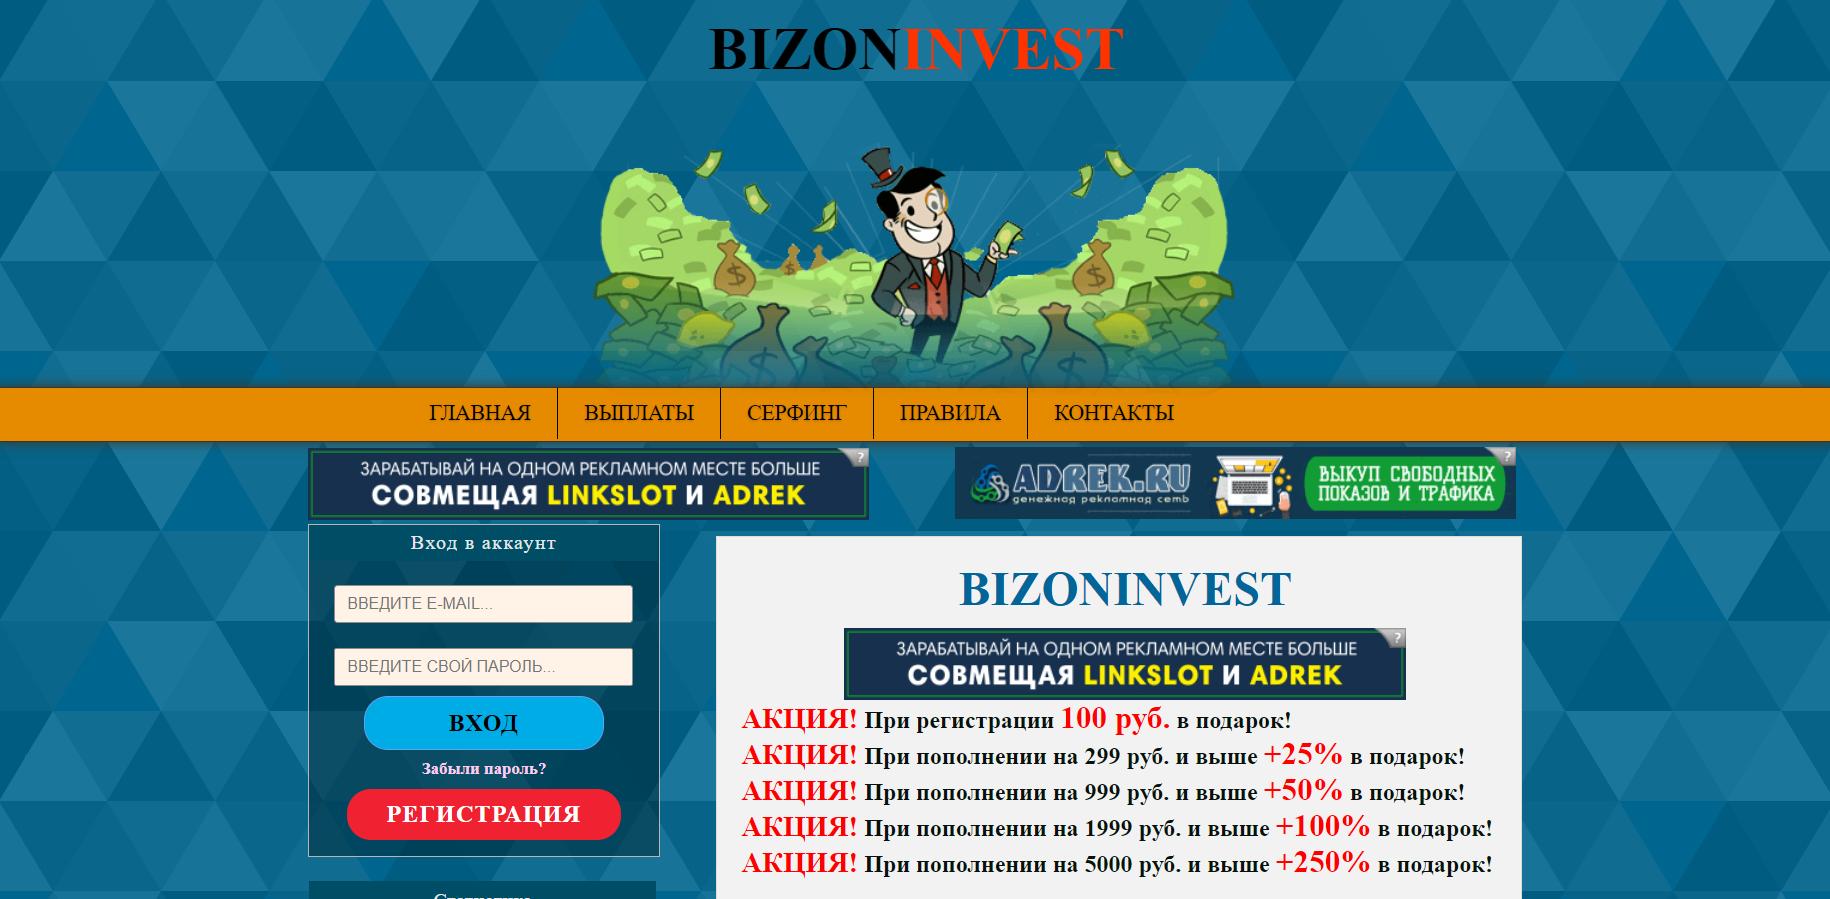 Bizoninvest.ru reviews